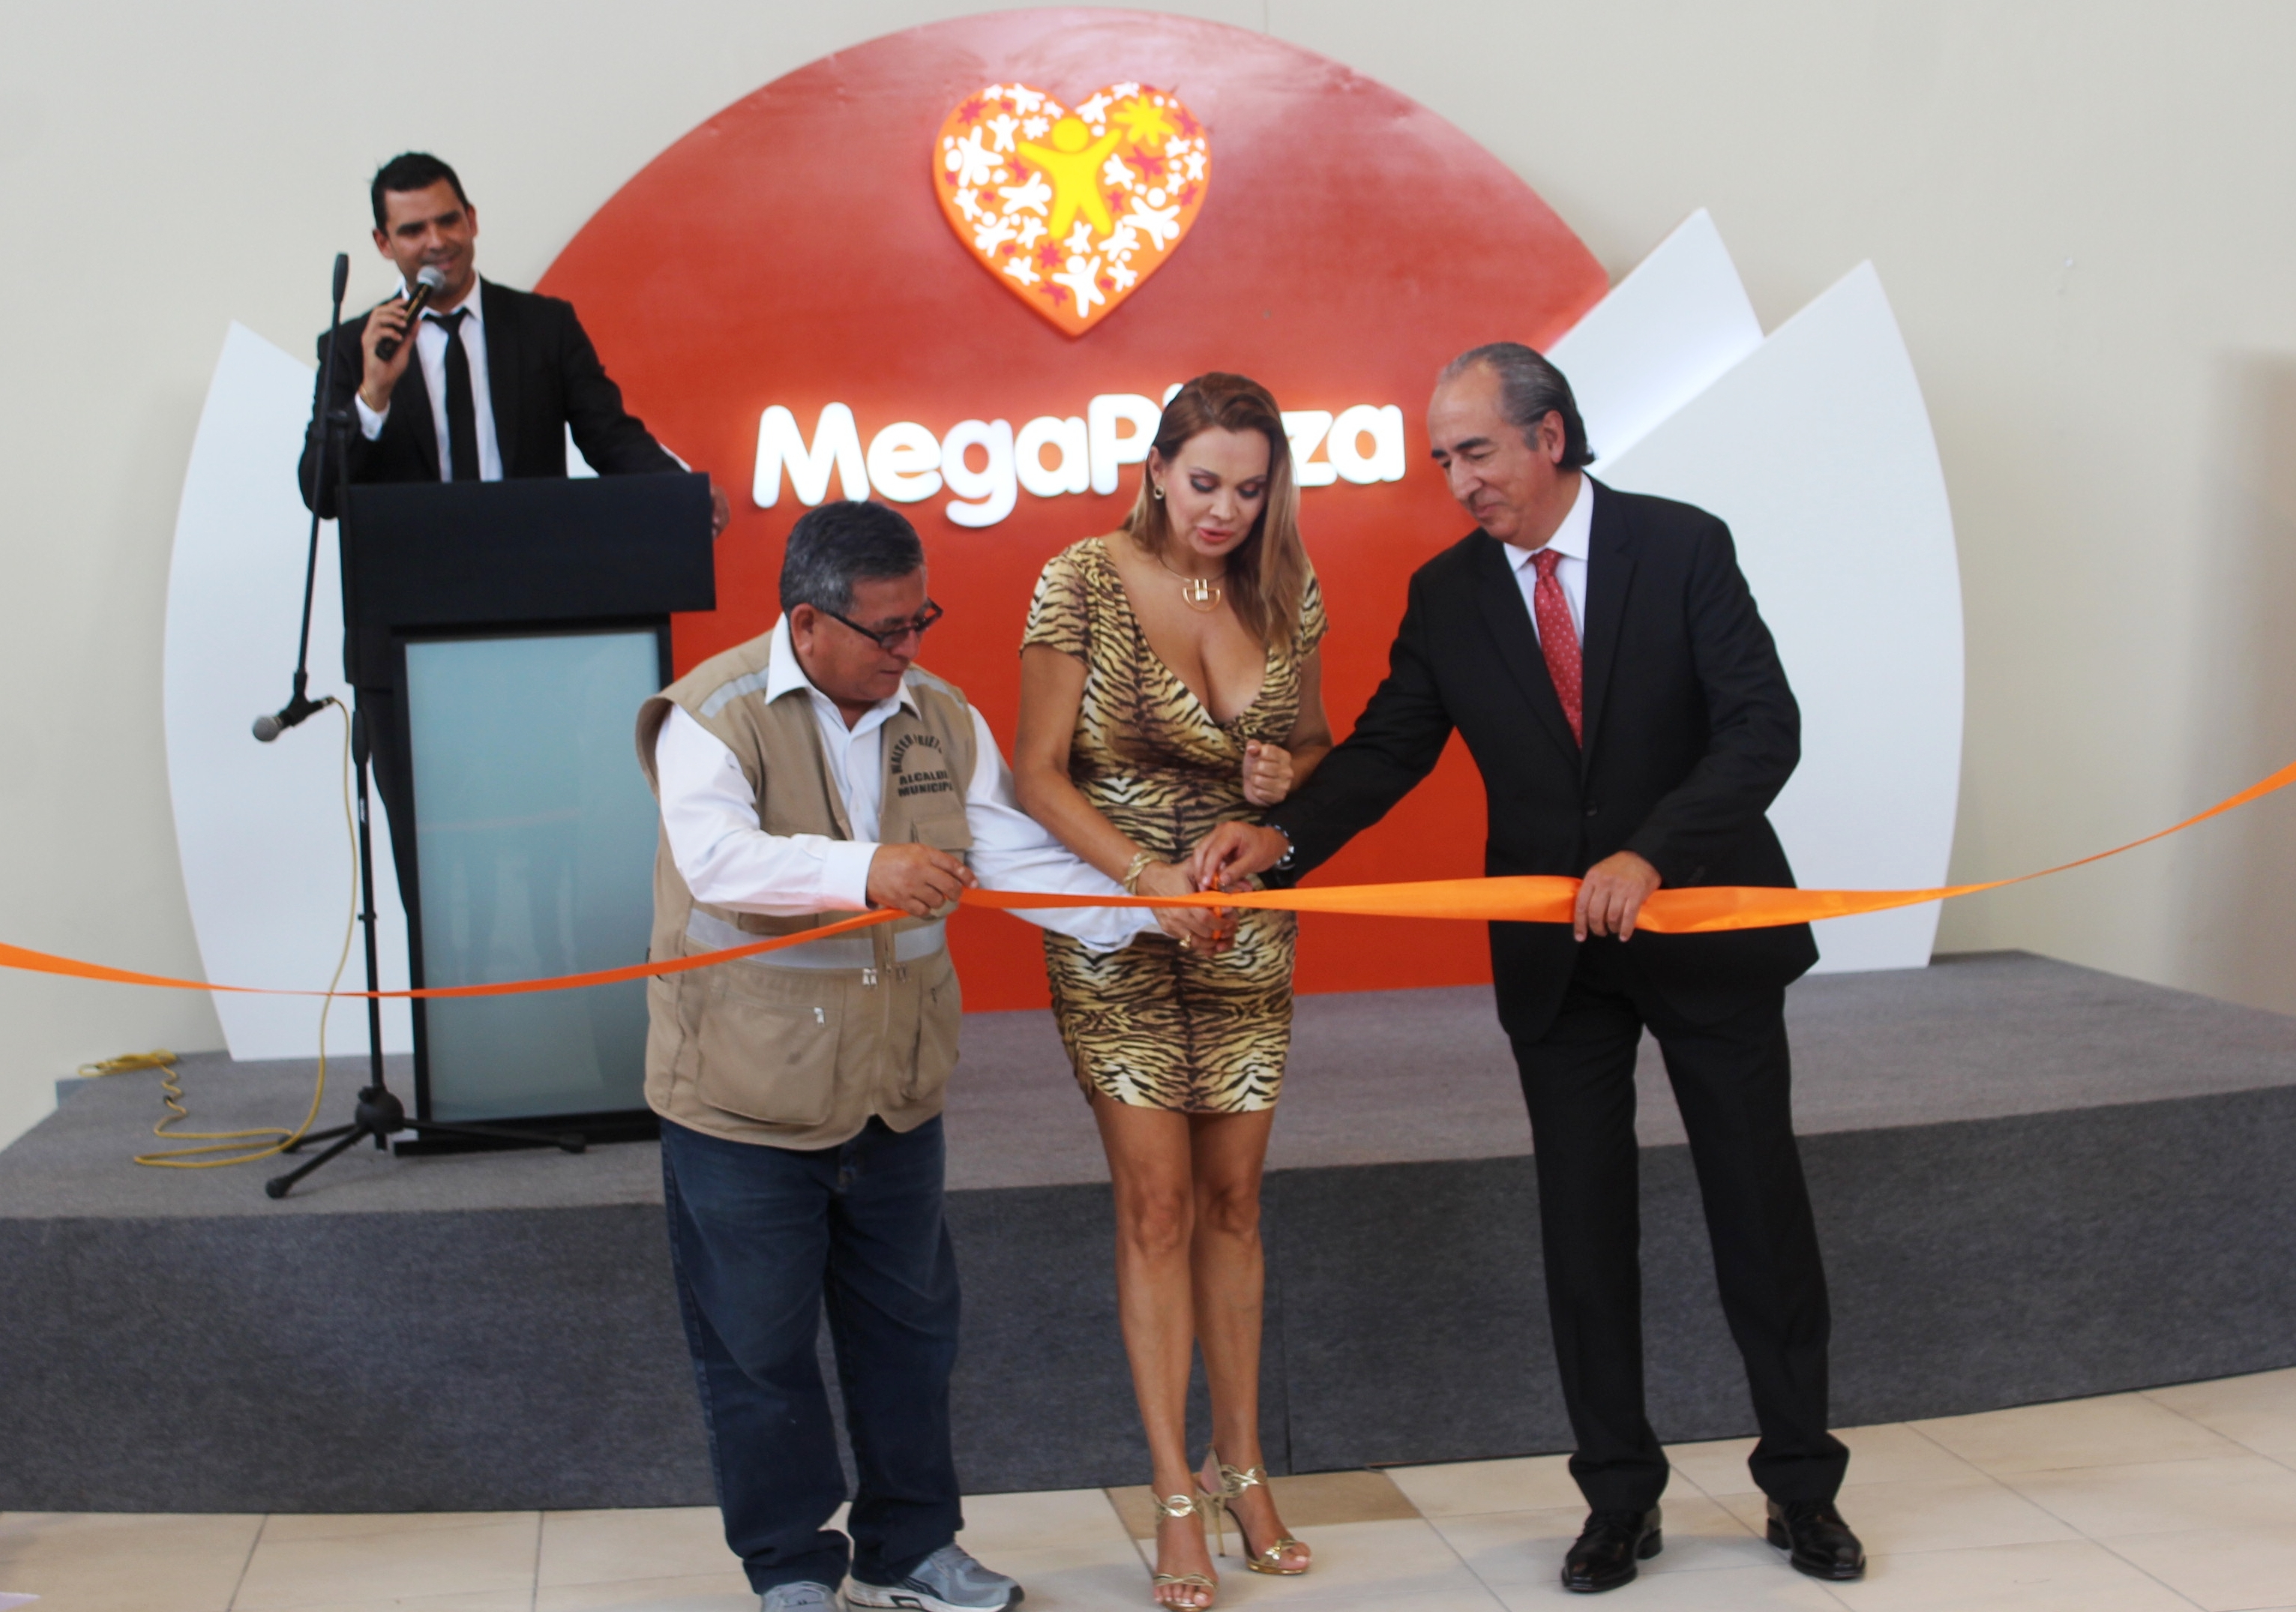 MegaPlaza Jaen 2 - MegaPlaza inaugura moderno mall en Jaén con inversión de US$ 15 millones